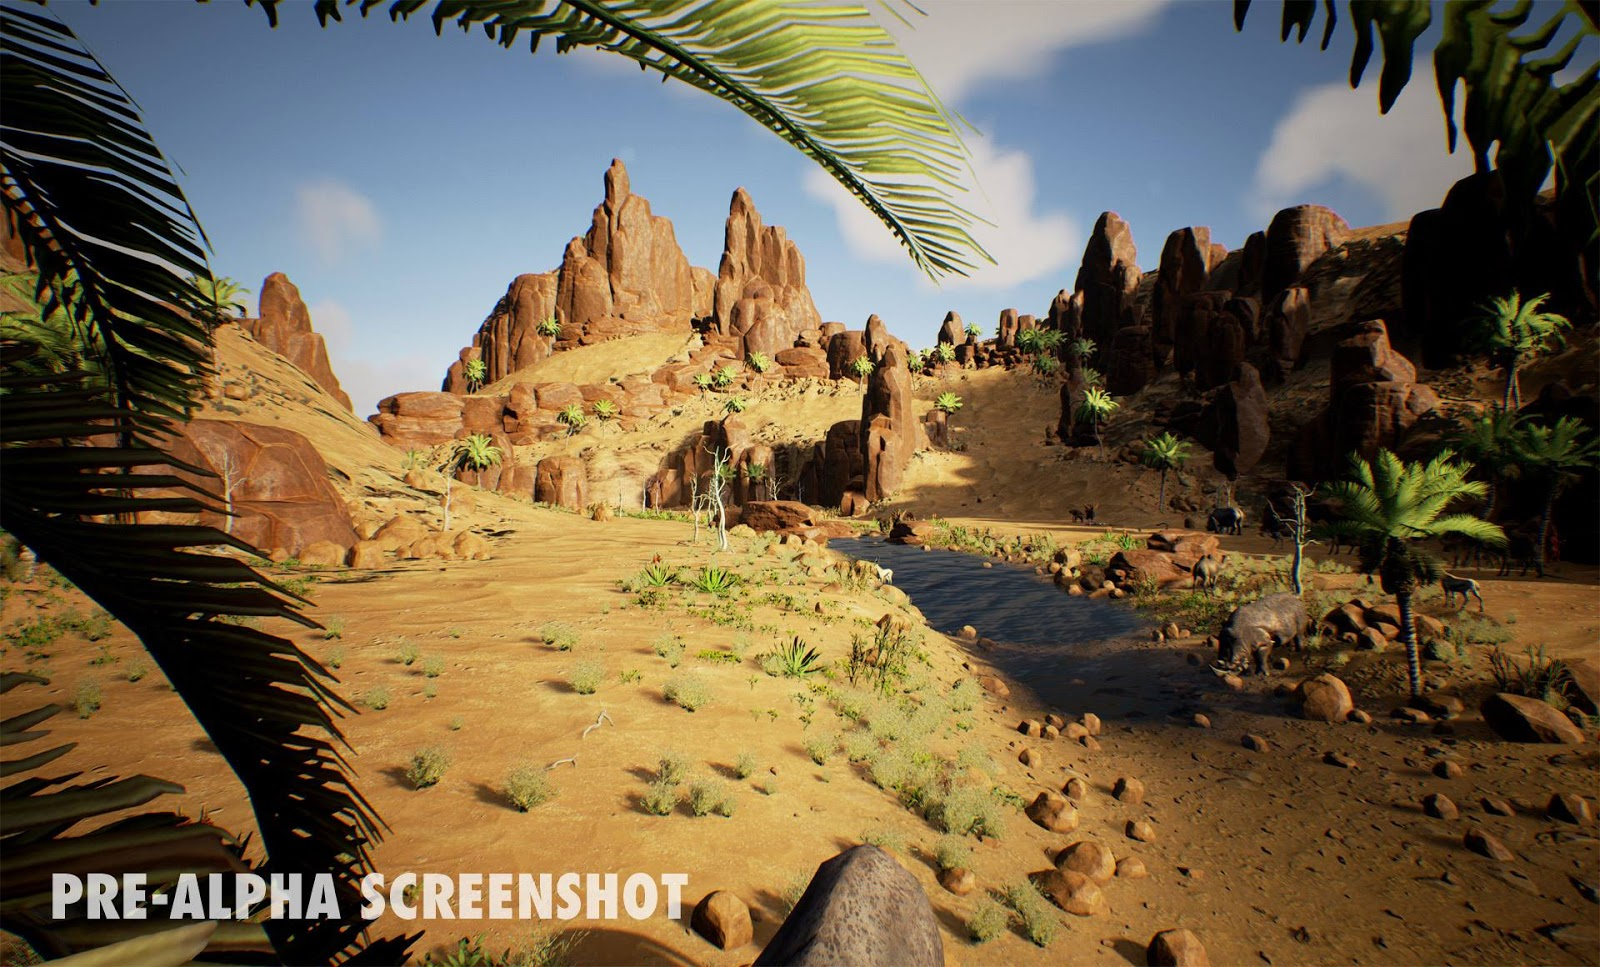 Conan Exiles sxreenshot 2